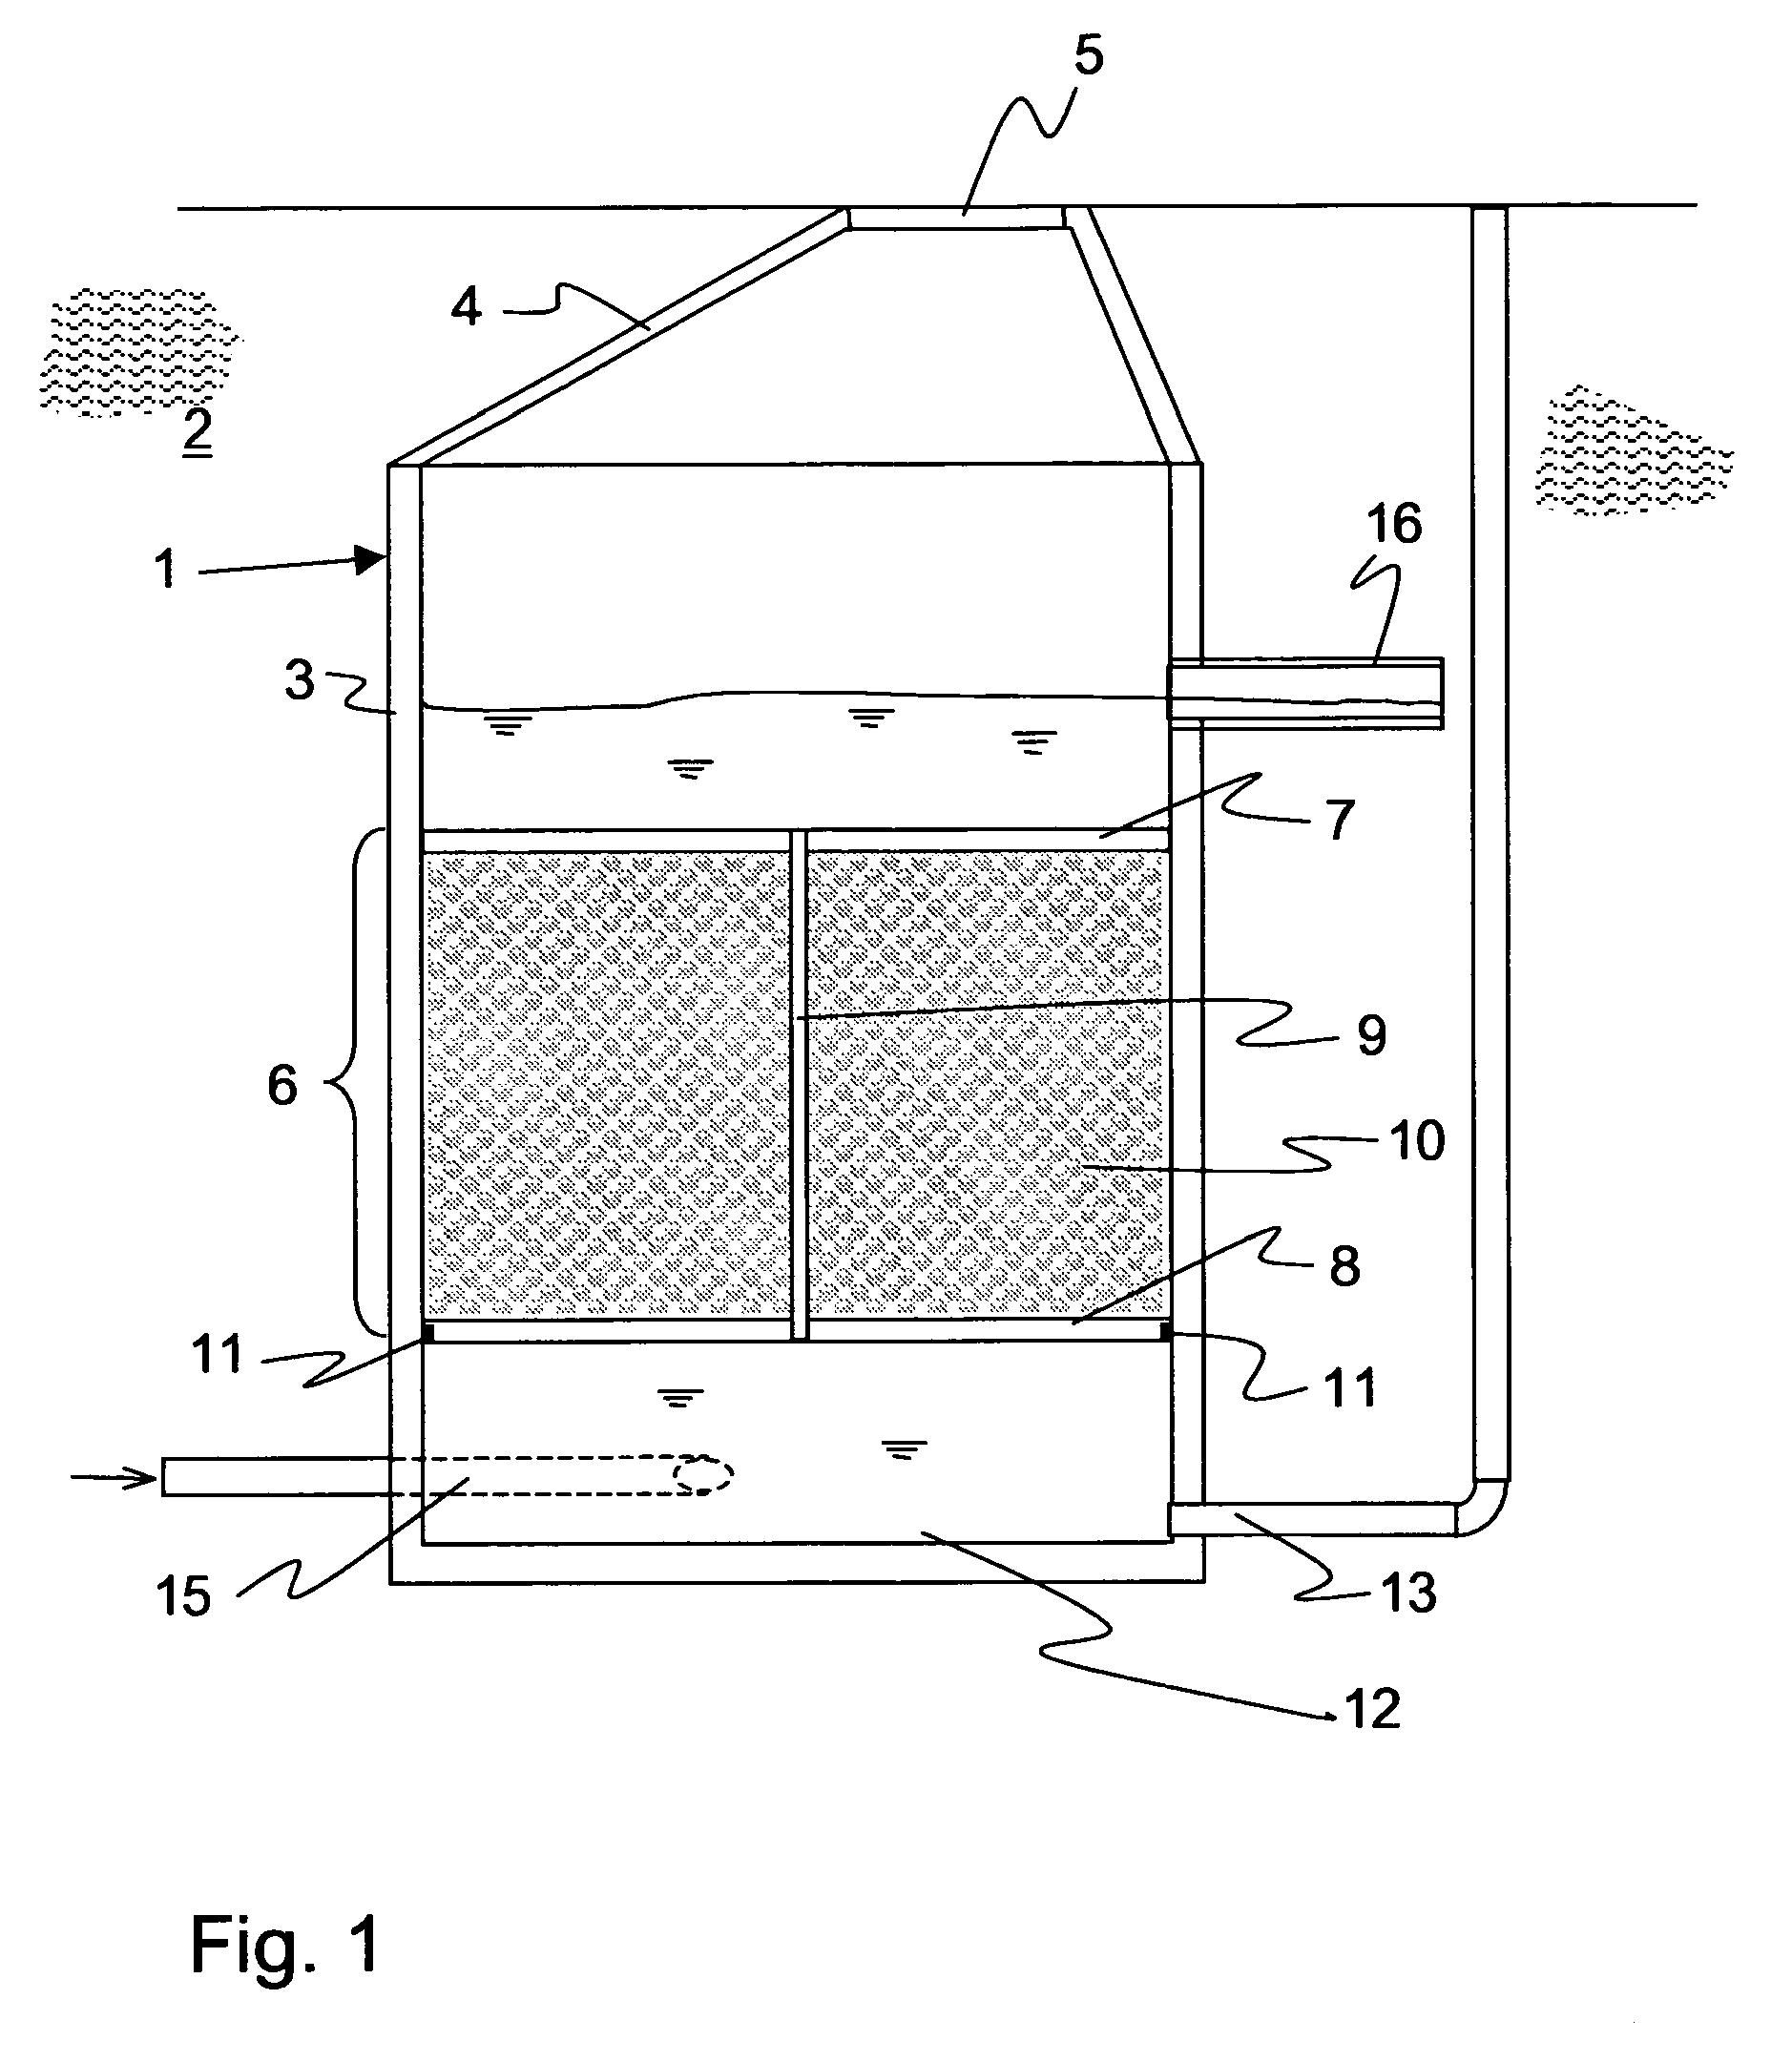 regenwasserversickerung selber bauen regenwasserversickerung regenwasserversickerung selber. Black Bedroom Furniture Sets. Home Design Ideas